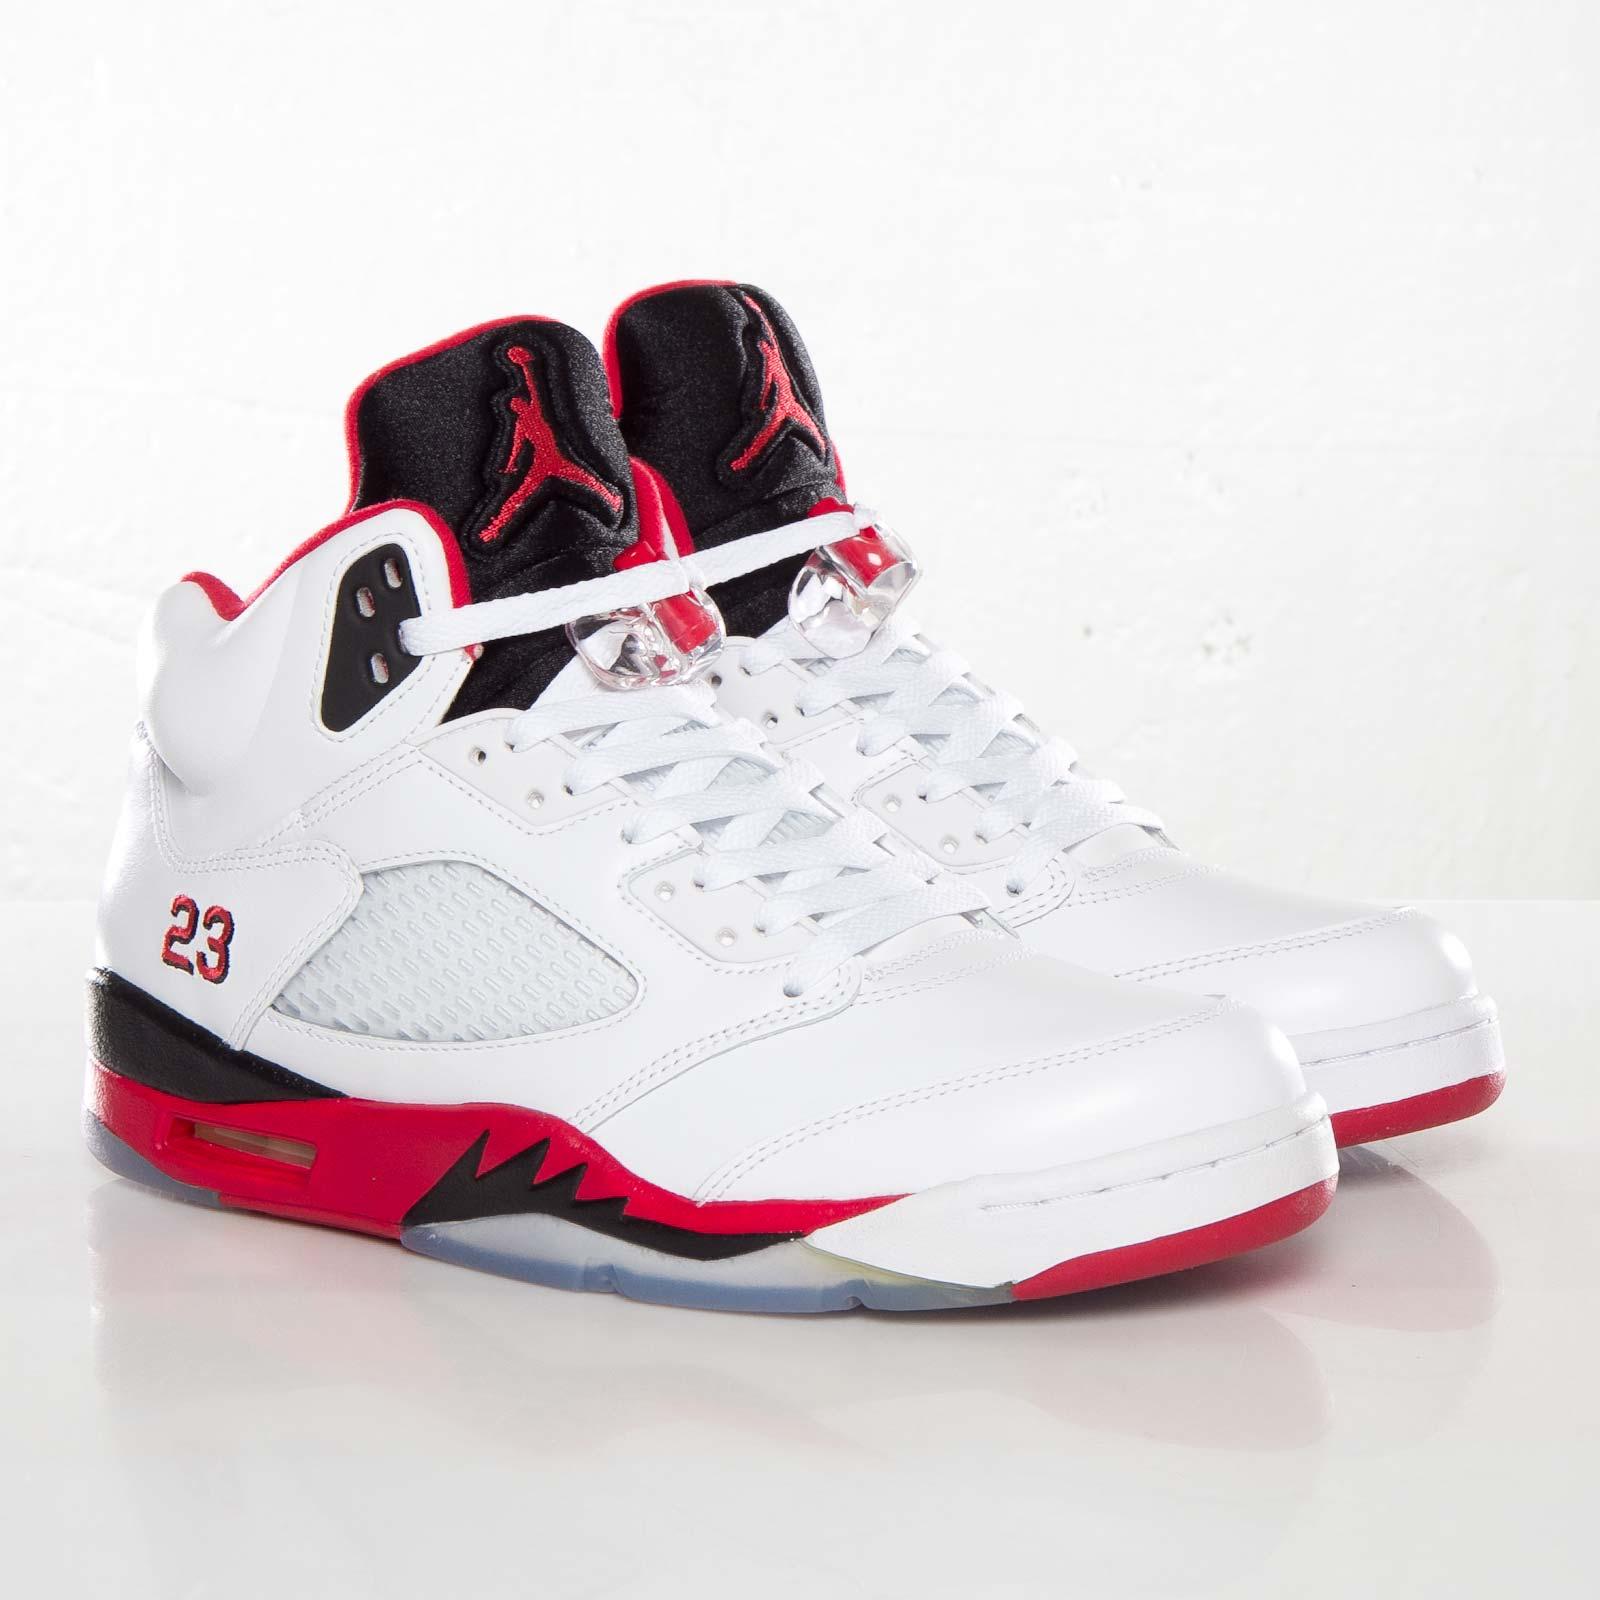 check out 597e2 6bb35 Jordan Brand Air Jordan 5 Retro